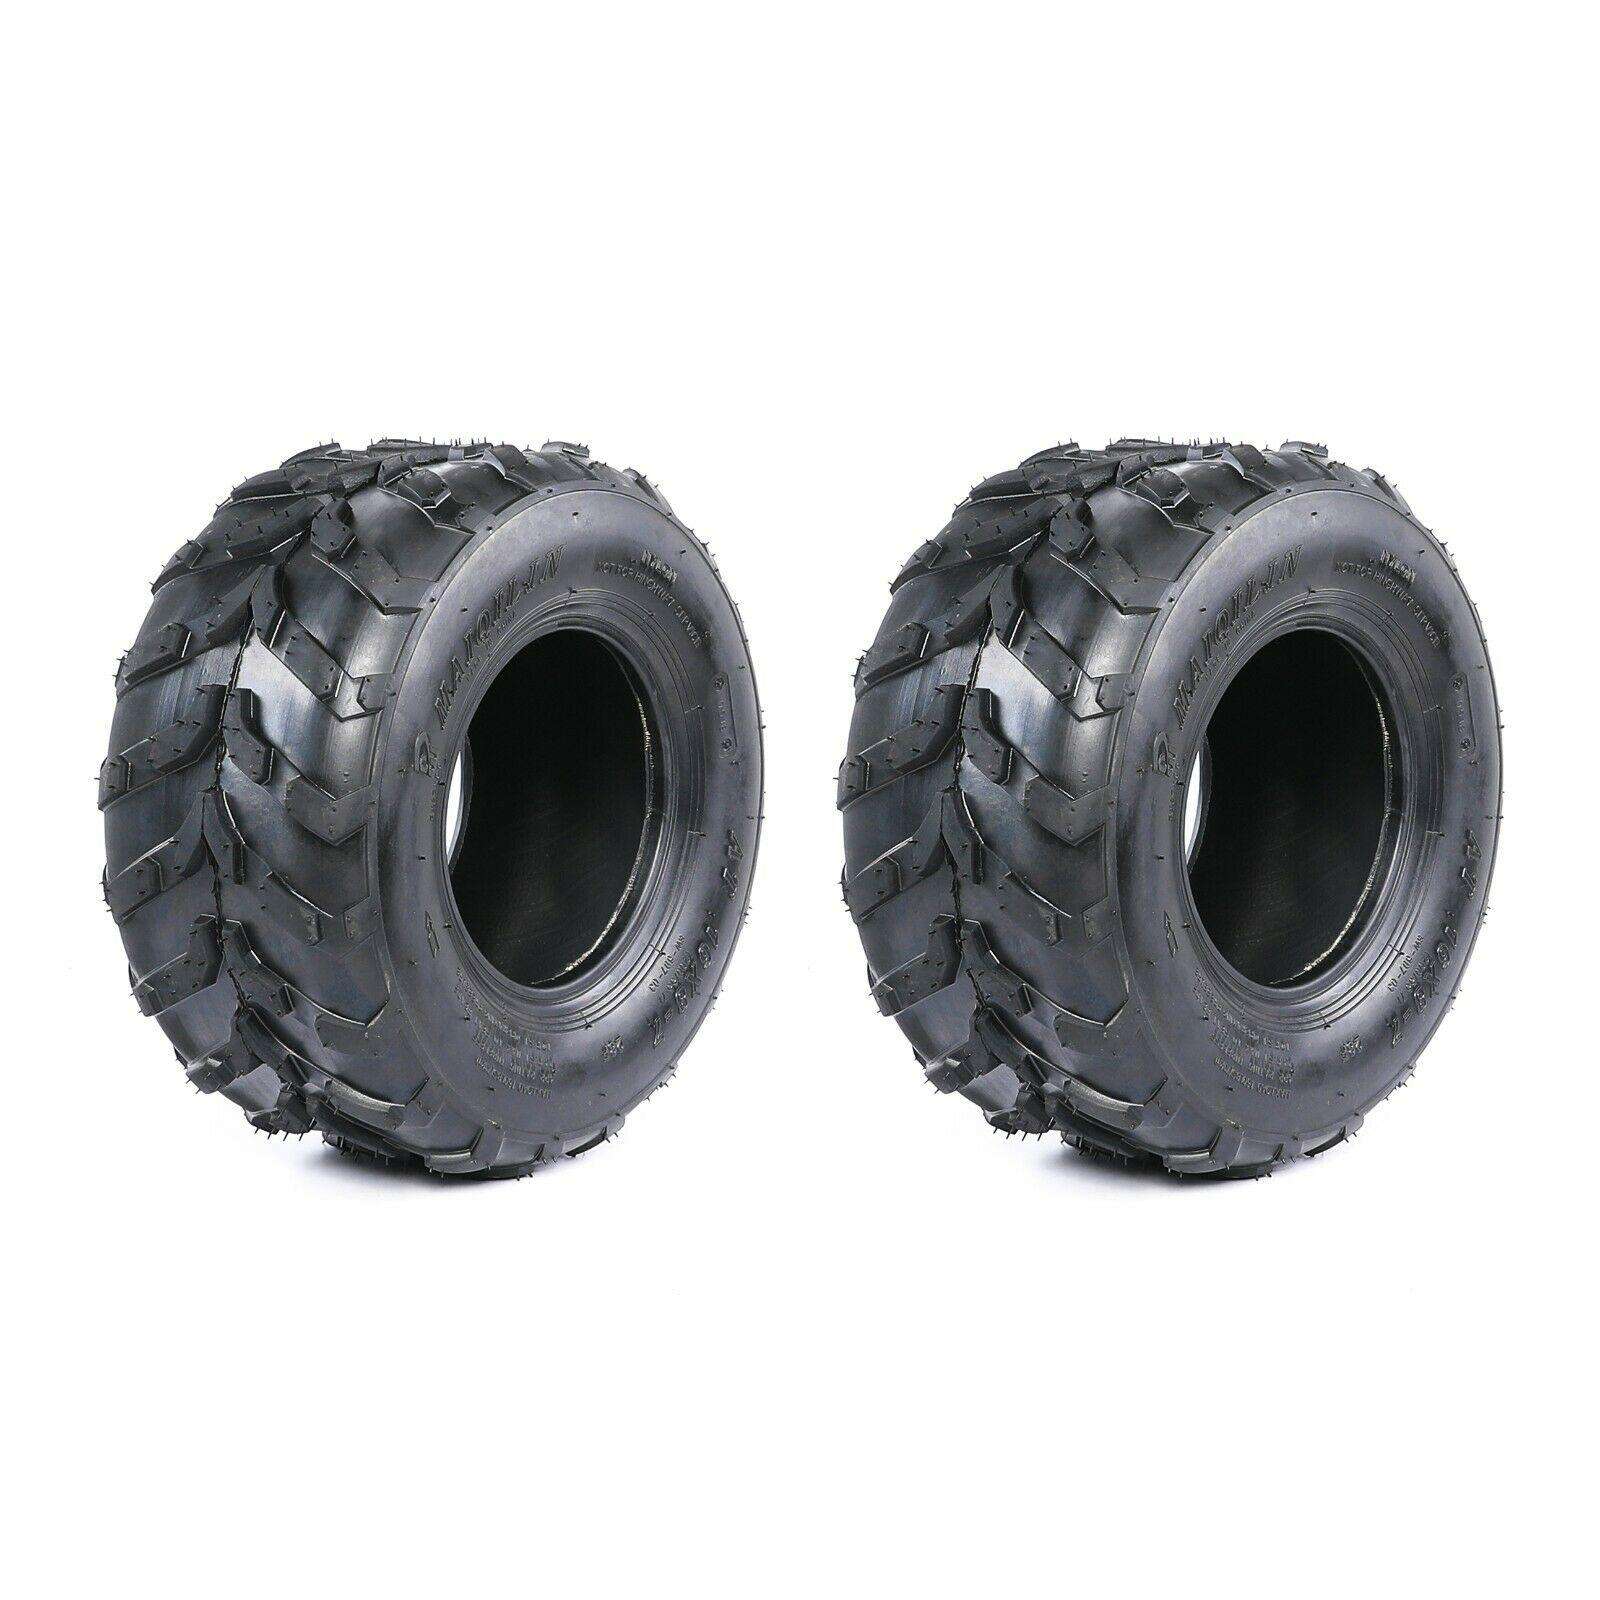 2 uds 16x8-7 neumático sin cámara 50cc 70cc 110cc 125cc Quad ATV Go Kart Kazuma 16x8x7